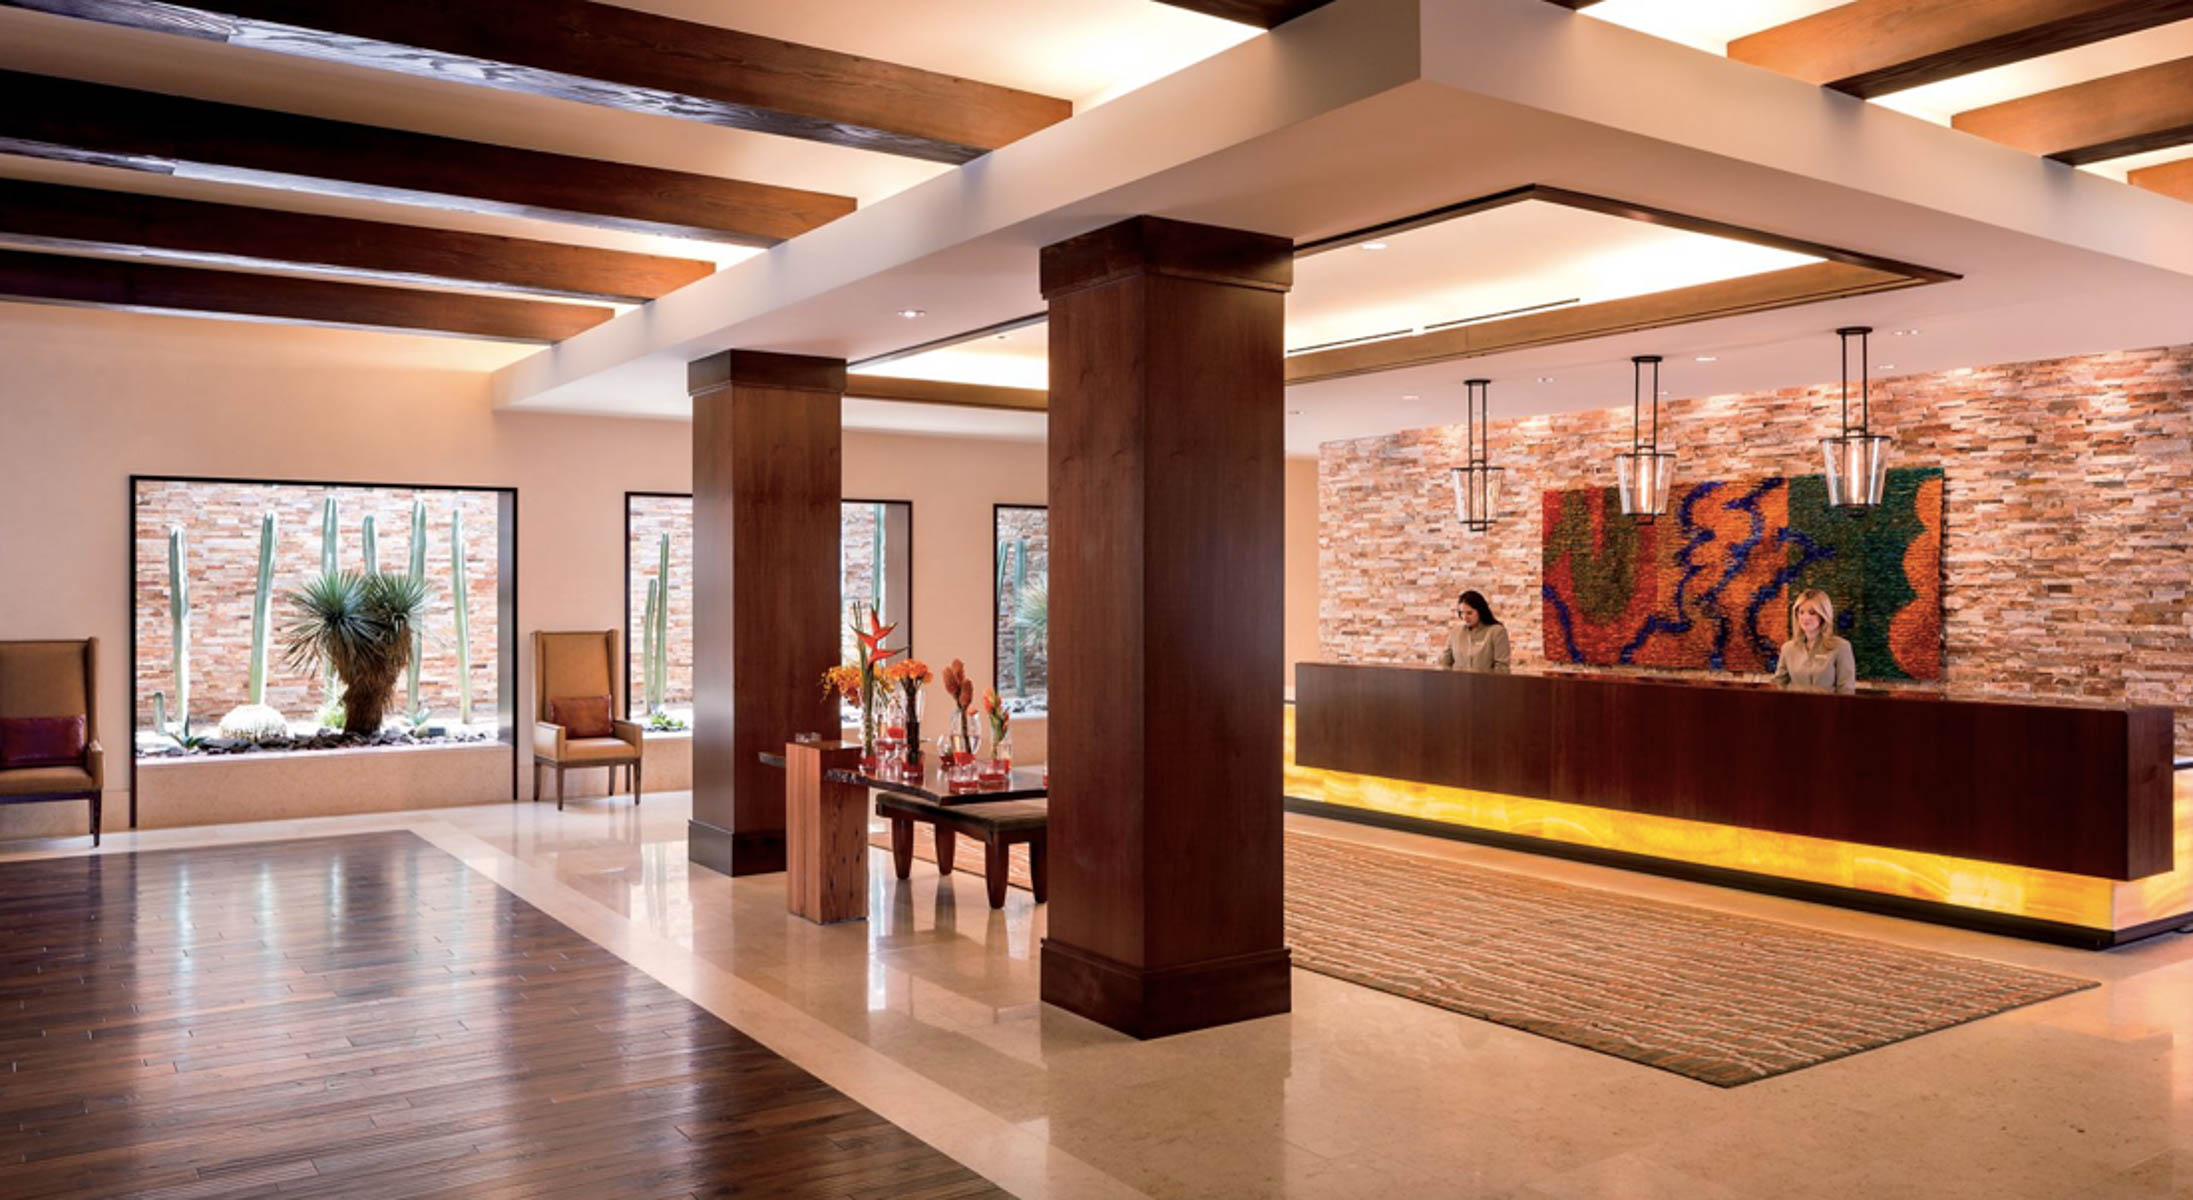 Best Palm Desert Travel Ideas_Palm Desert Hotels_Palm Desert_resorts_Addie Bell-20.jpg